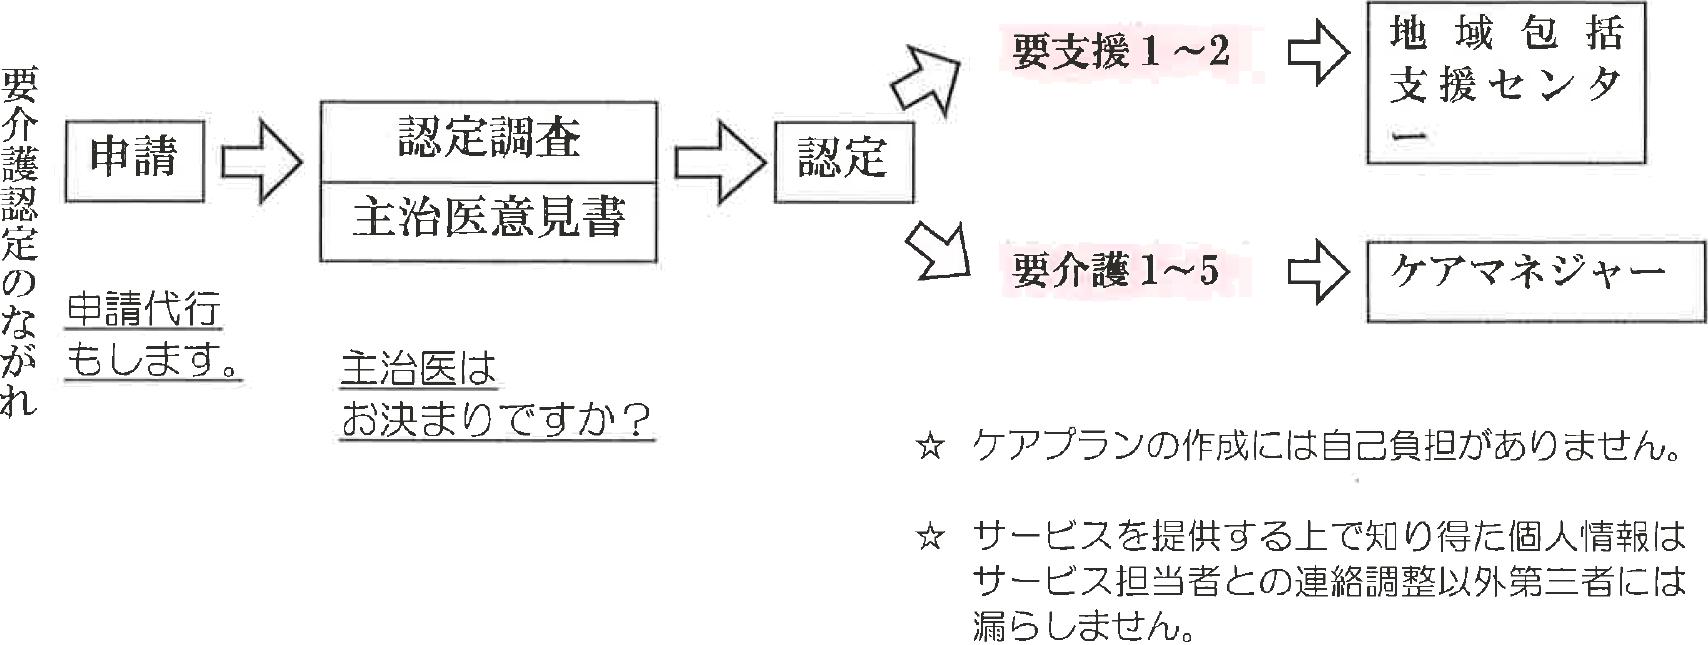 itaku02